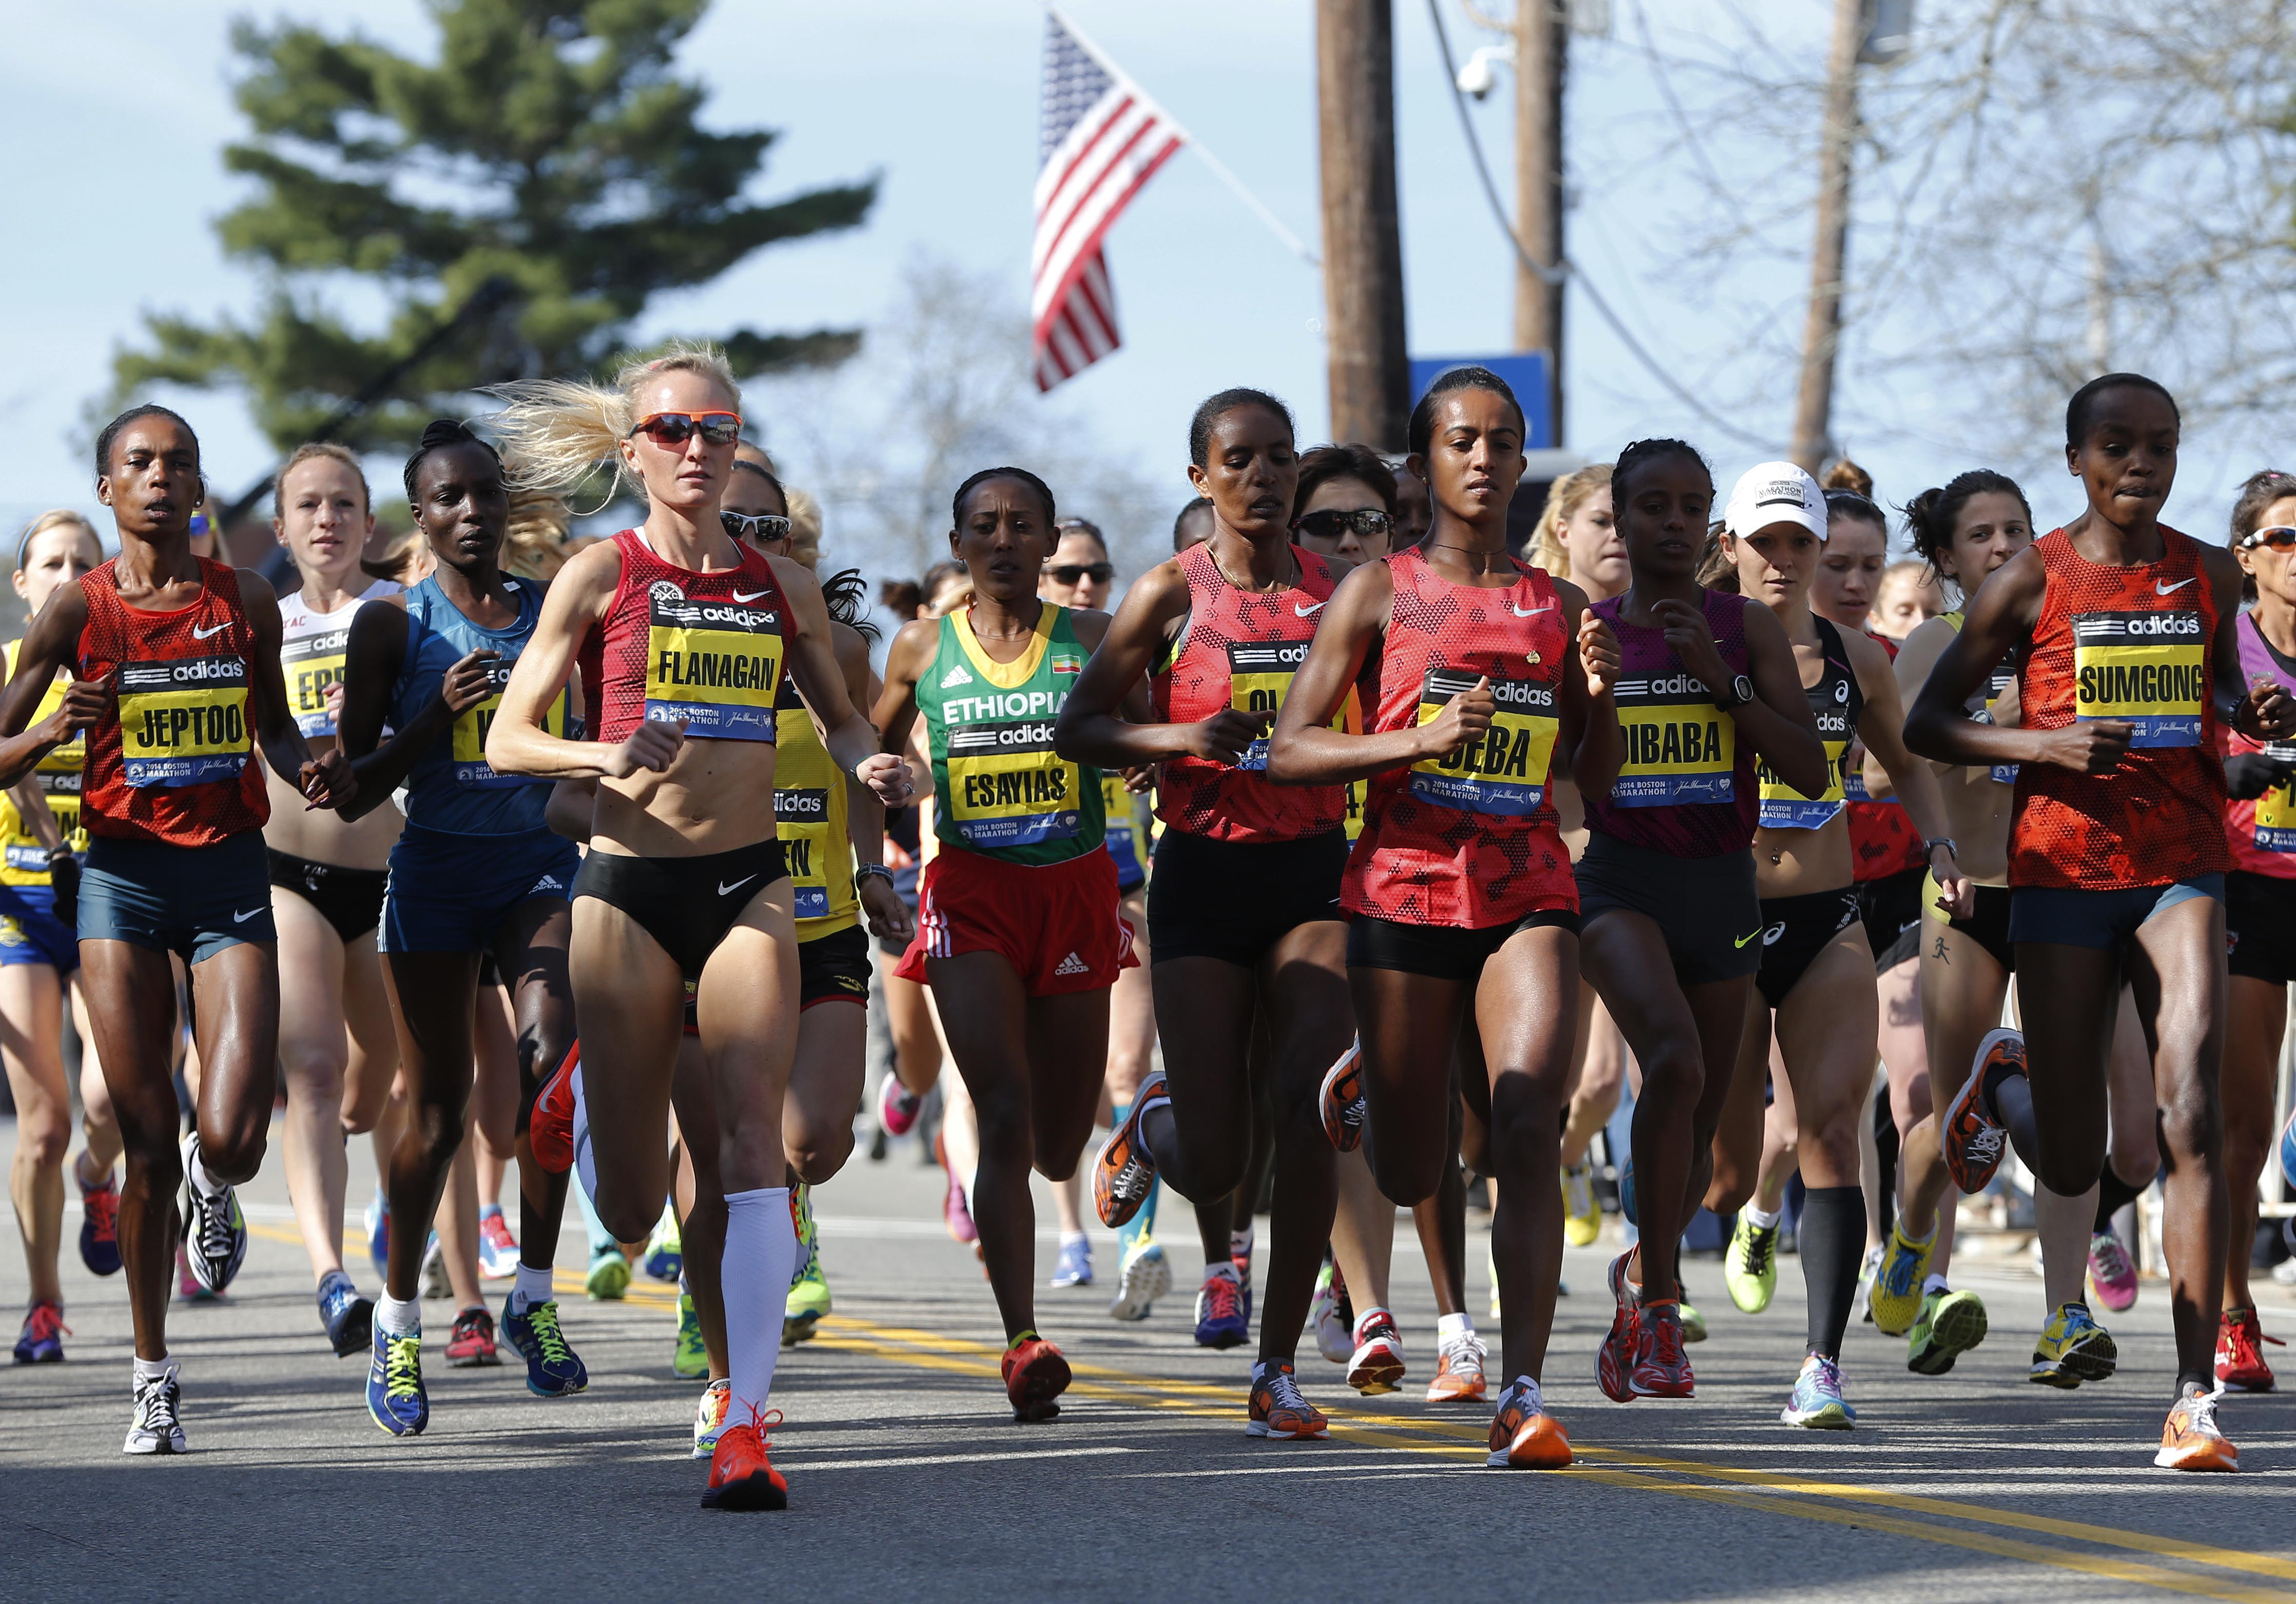 From left, Rita Jeptoo, Shalane Flanagan, Yeshi Esayias, Buzunesh Deba, Mare Dibaba, and Jemima Jelagat Sumgong run shortly after the start in the women's division of the 118th Boston Marathon Monday, April 21, 2014 in Hopkinton, Mass. (AP Photo/Michael Dwyer)